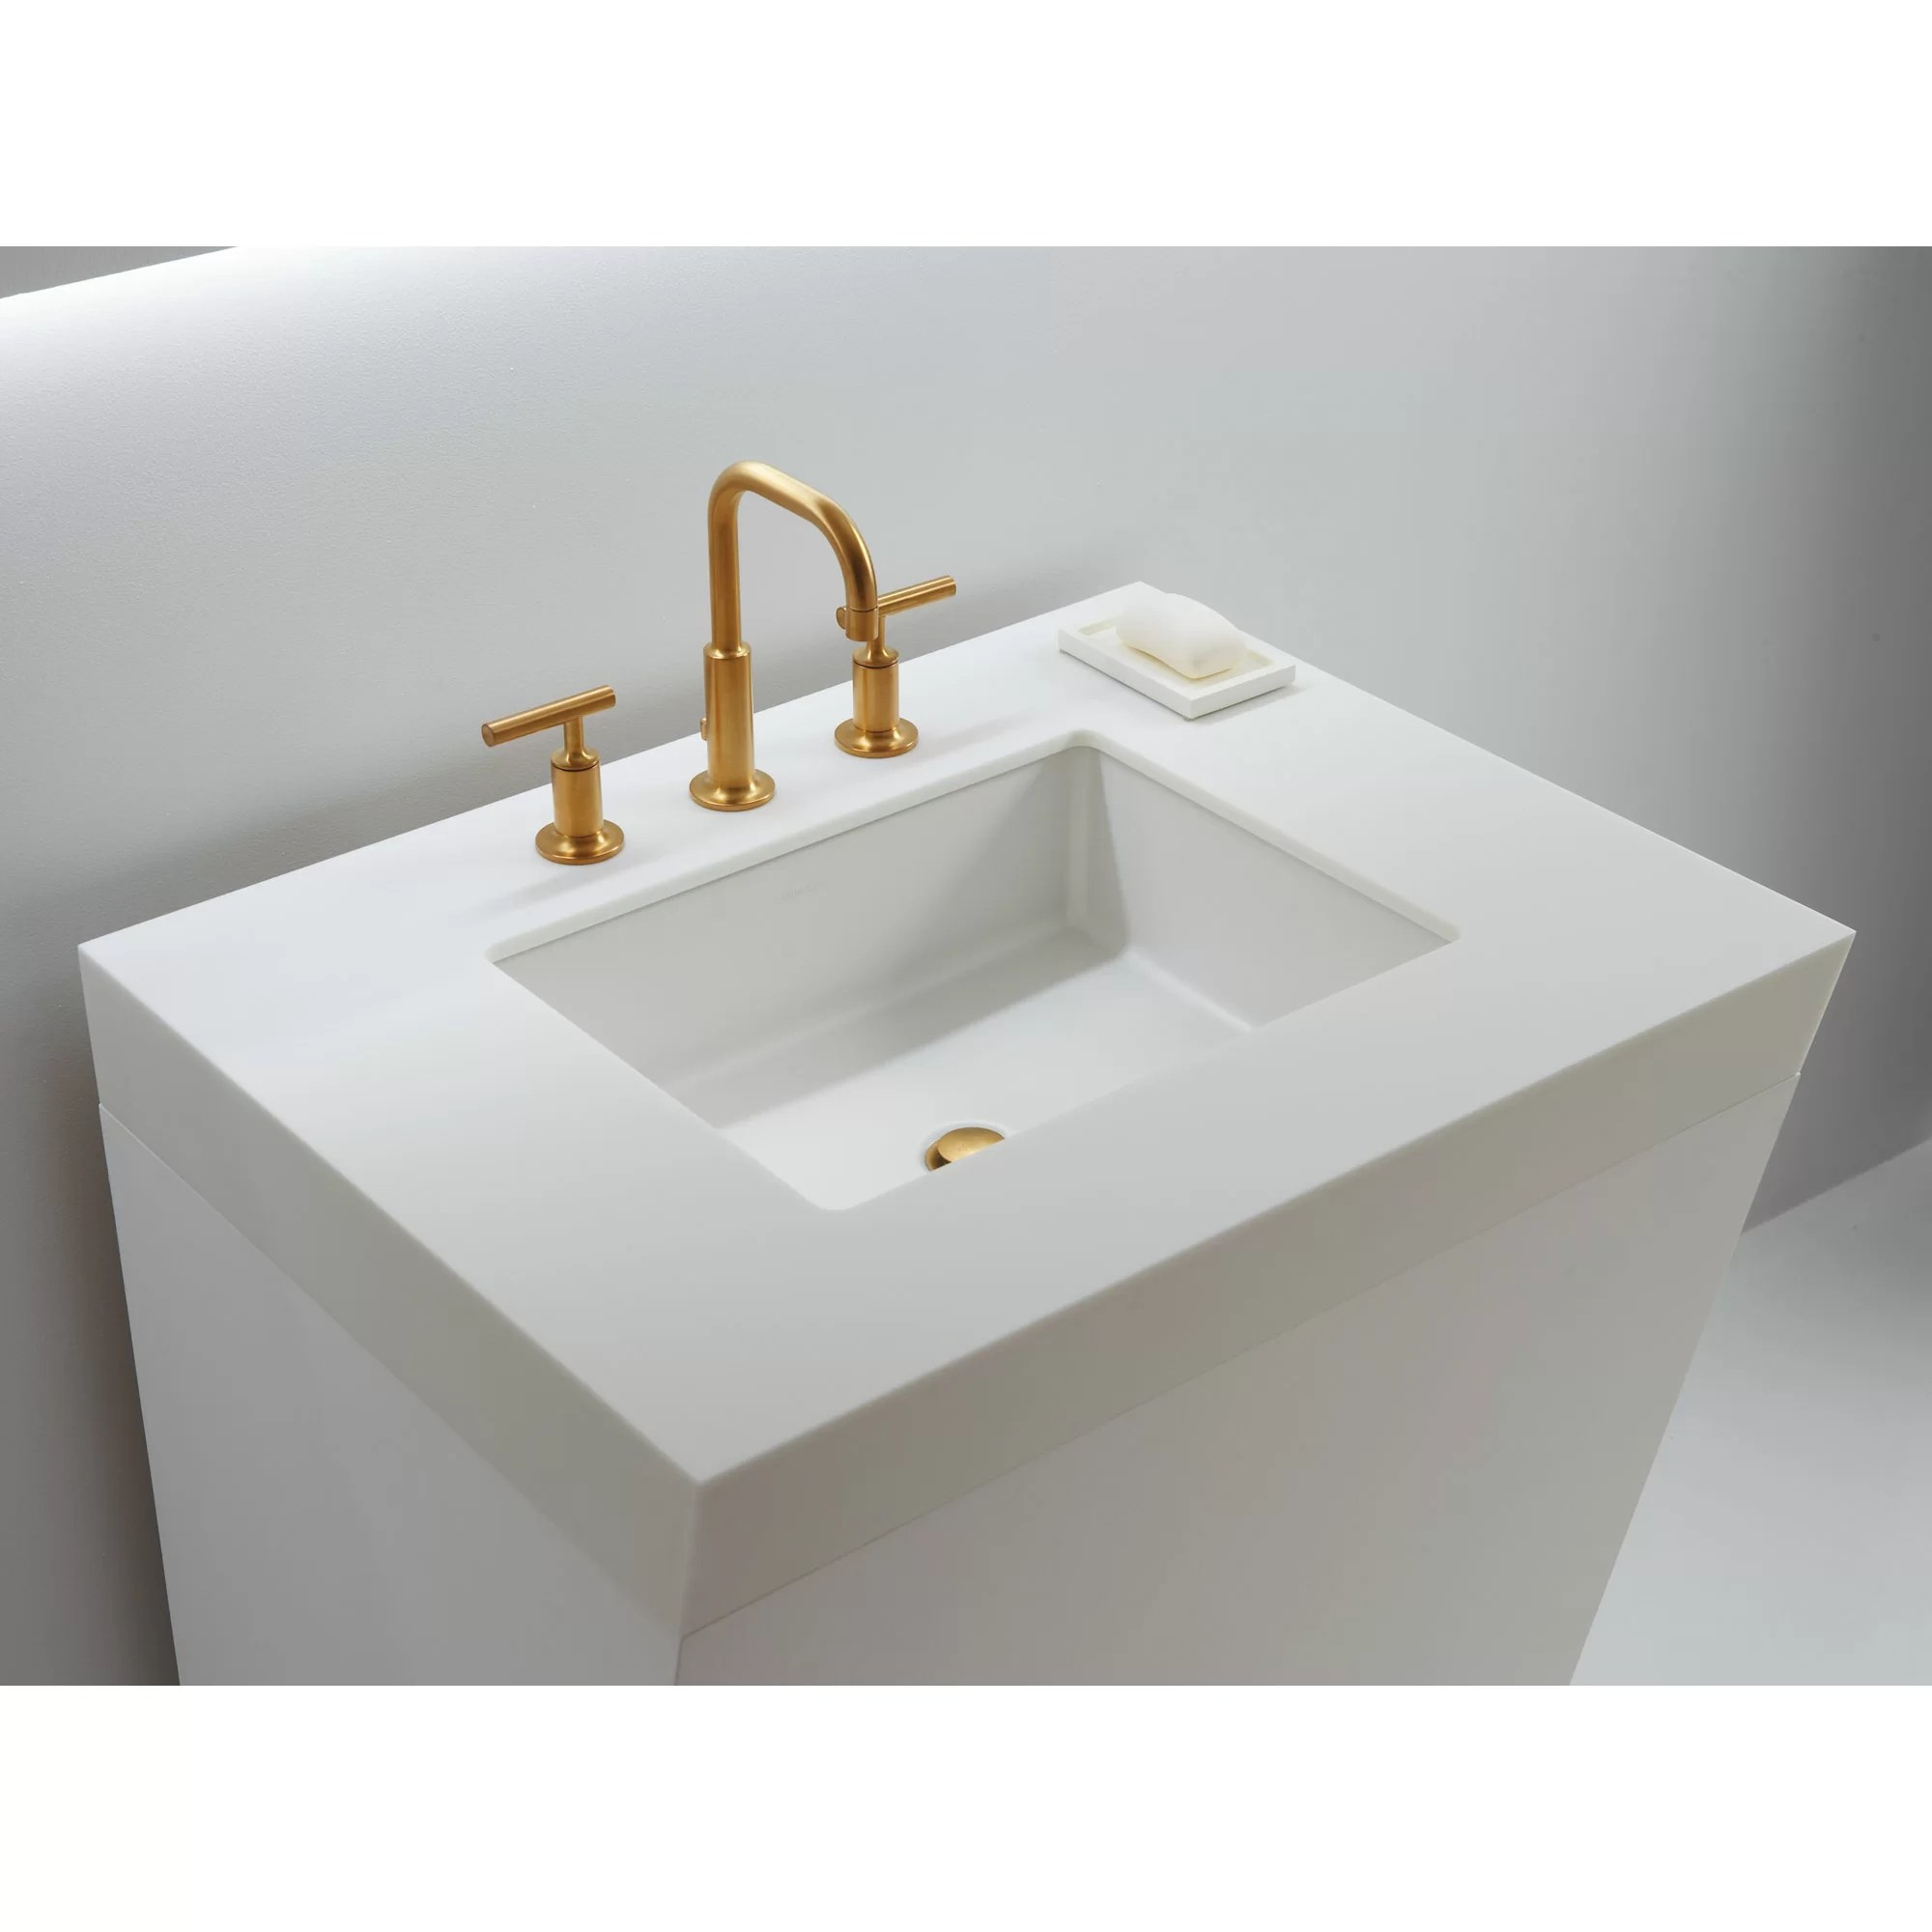 Bathroom Sink Undermount